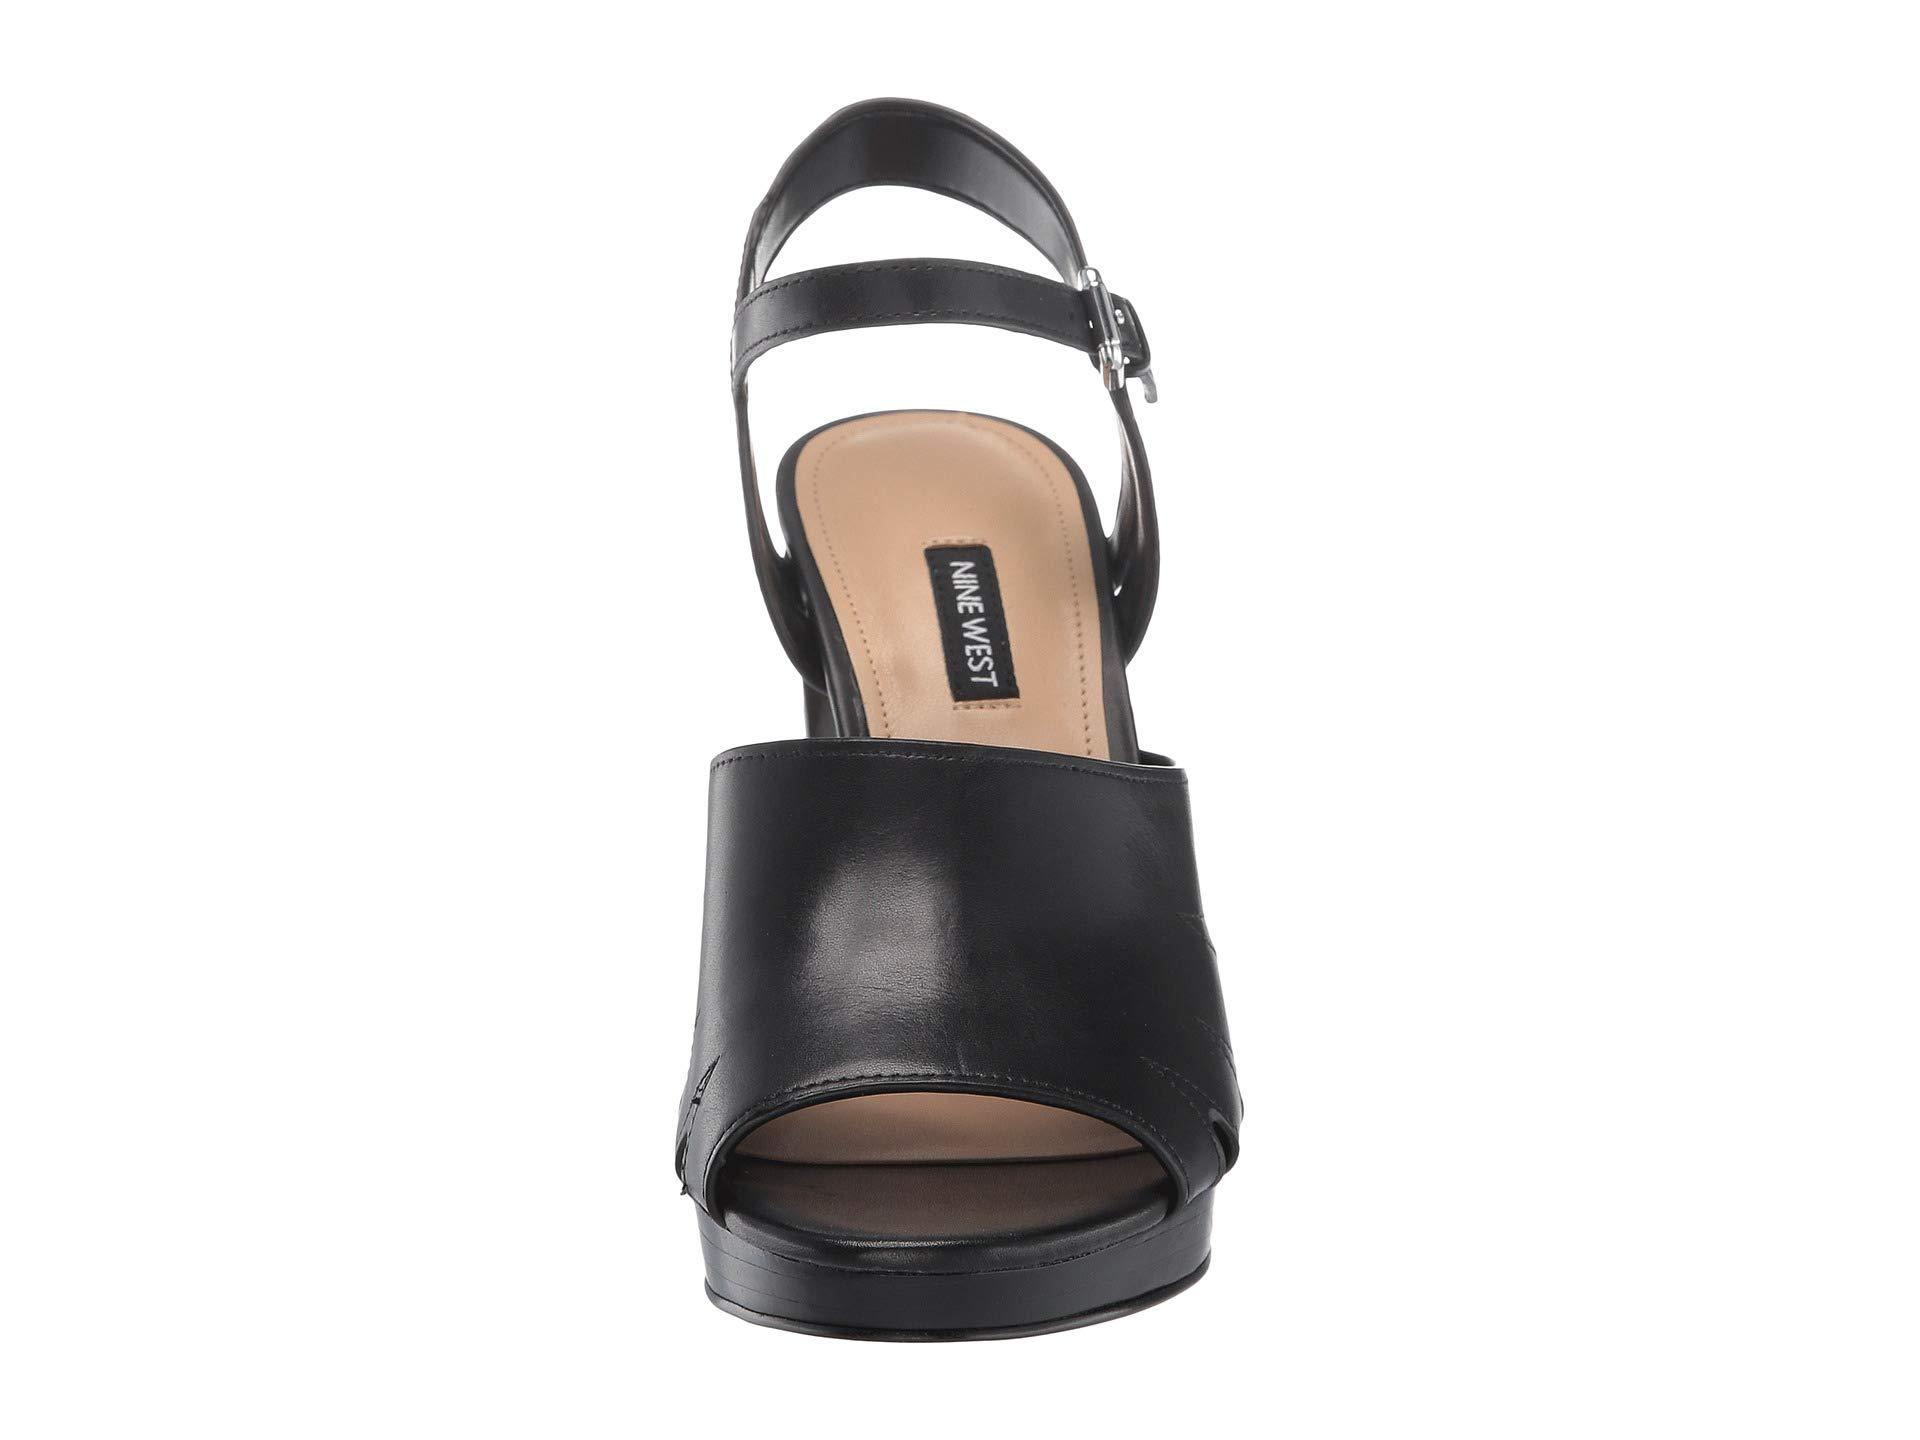 68ea40c41e38 Nine West Delilah (black) Women's Shoes in Black - Lyst